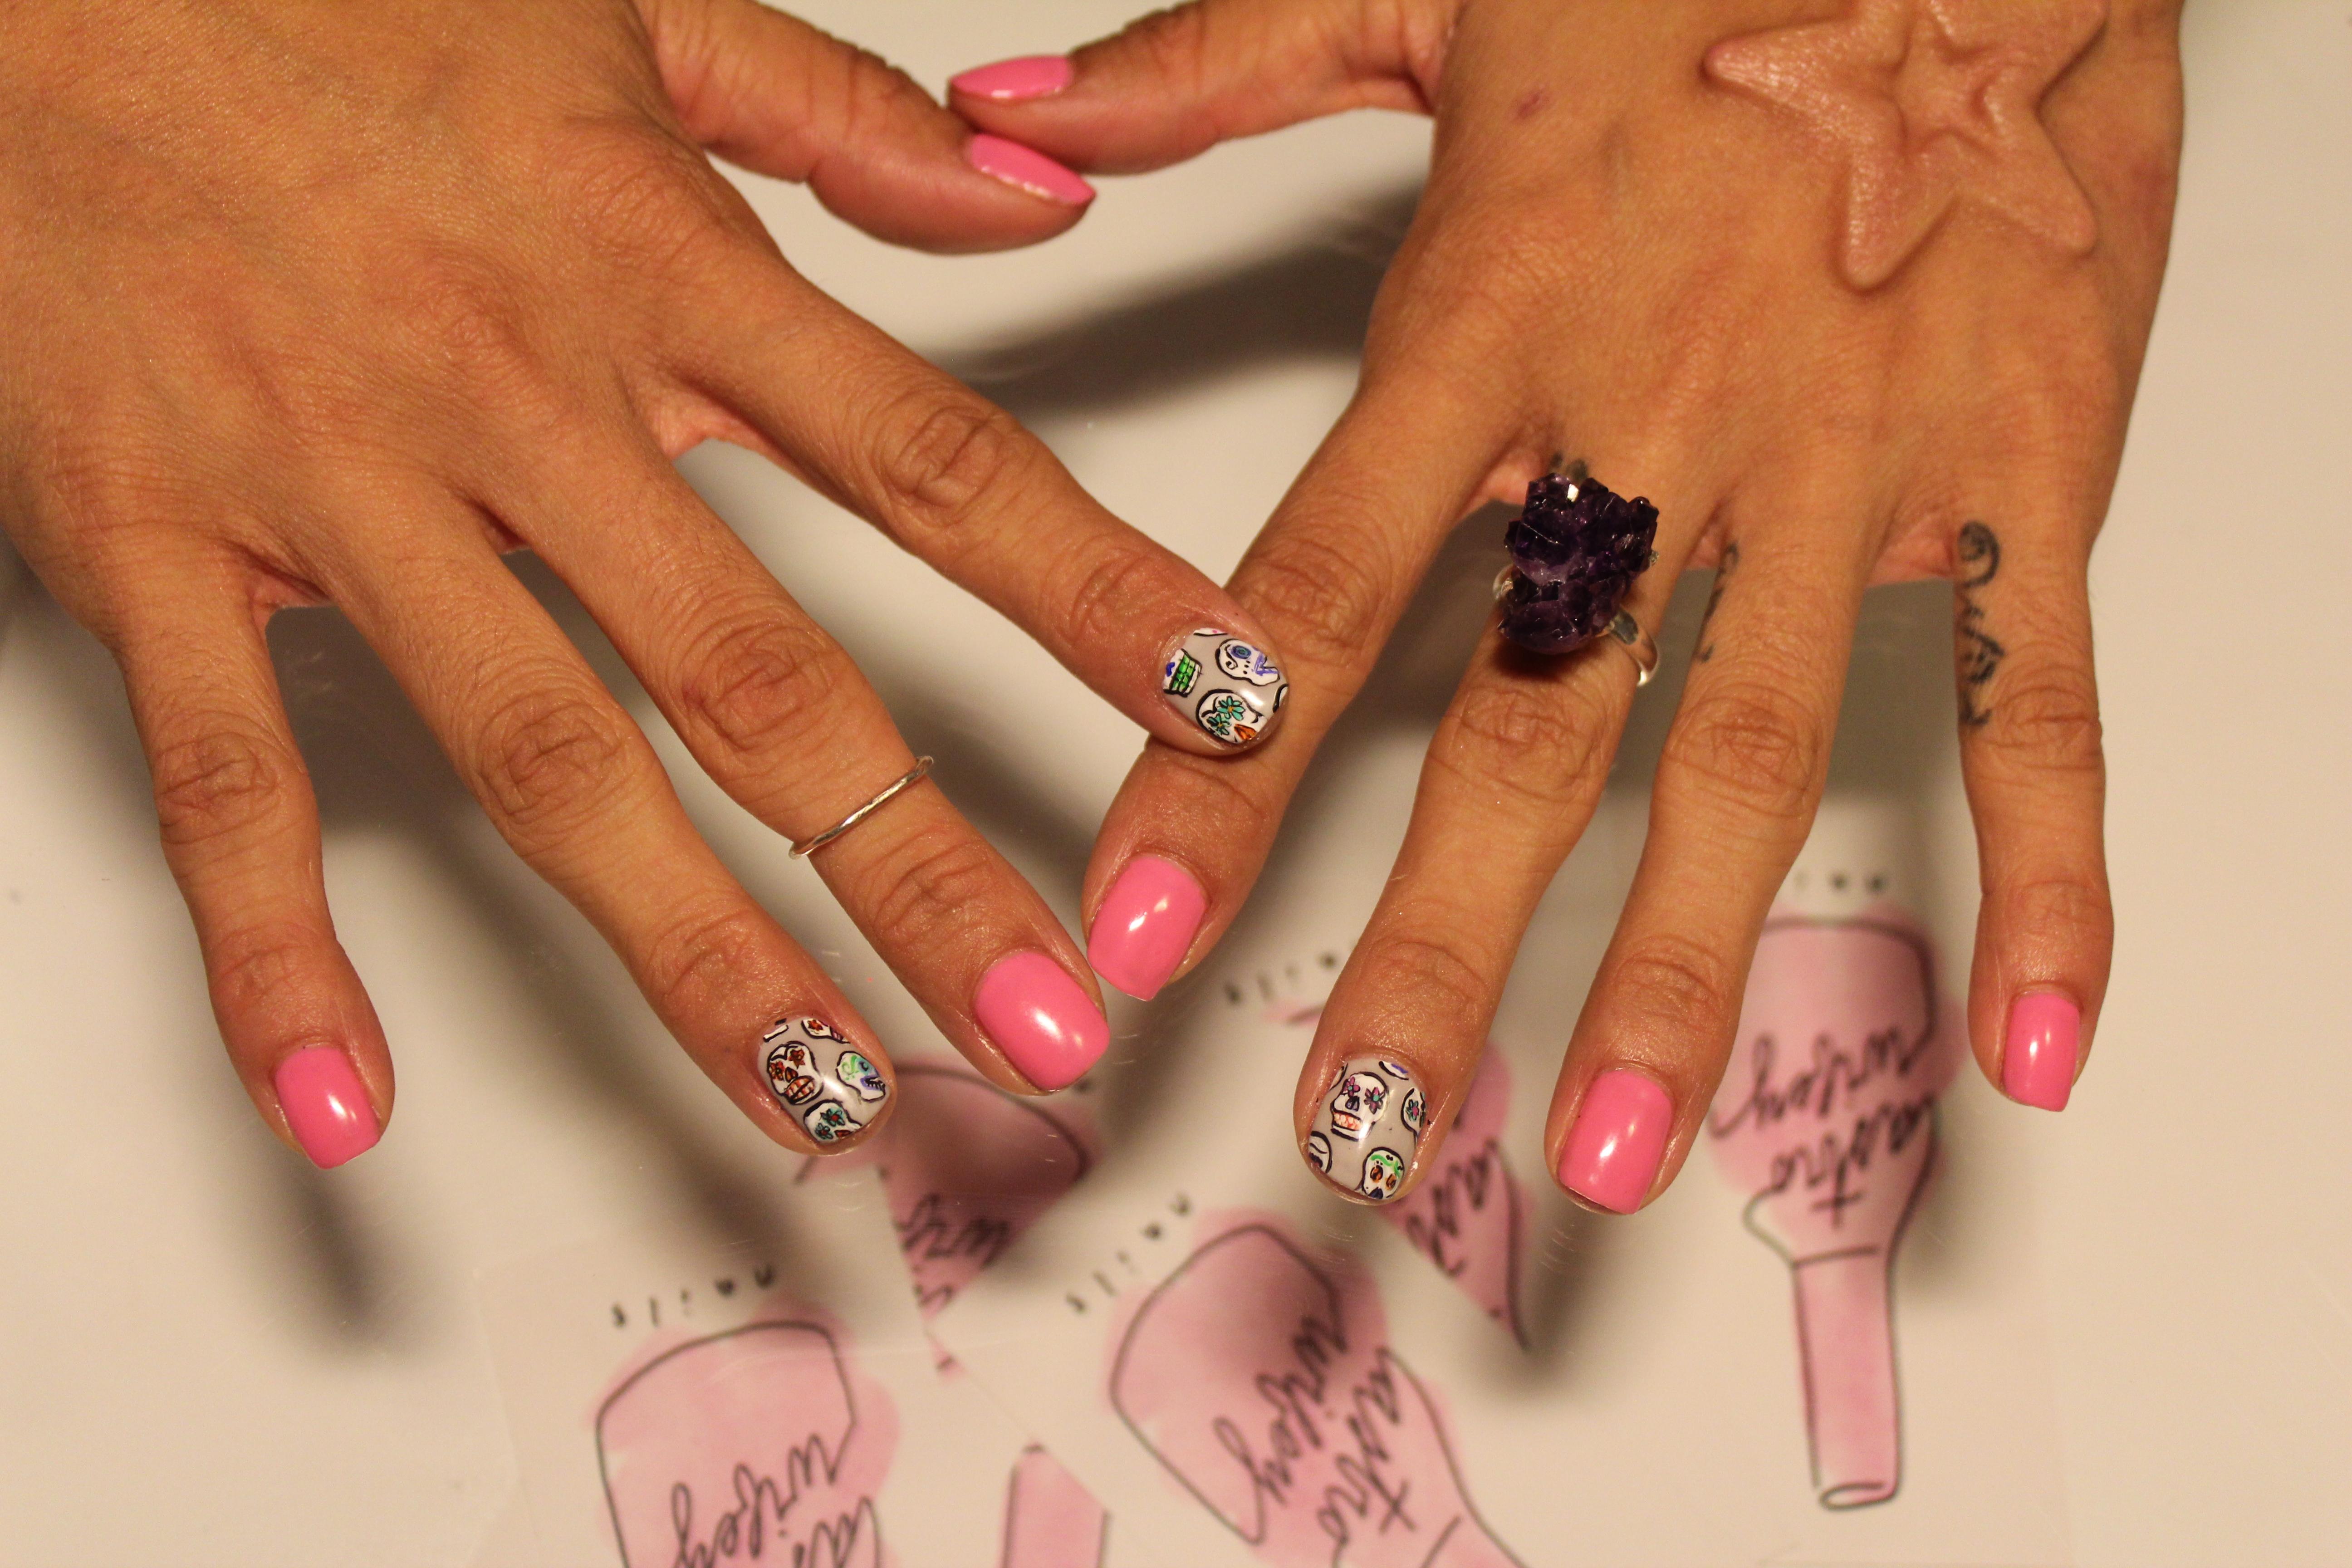 astrowifey | Designer Manicurist | Nail Blogger | Page 29